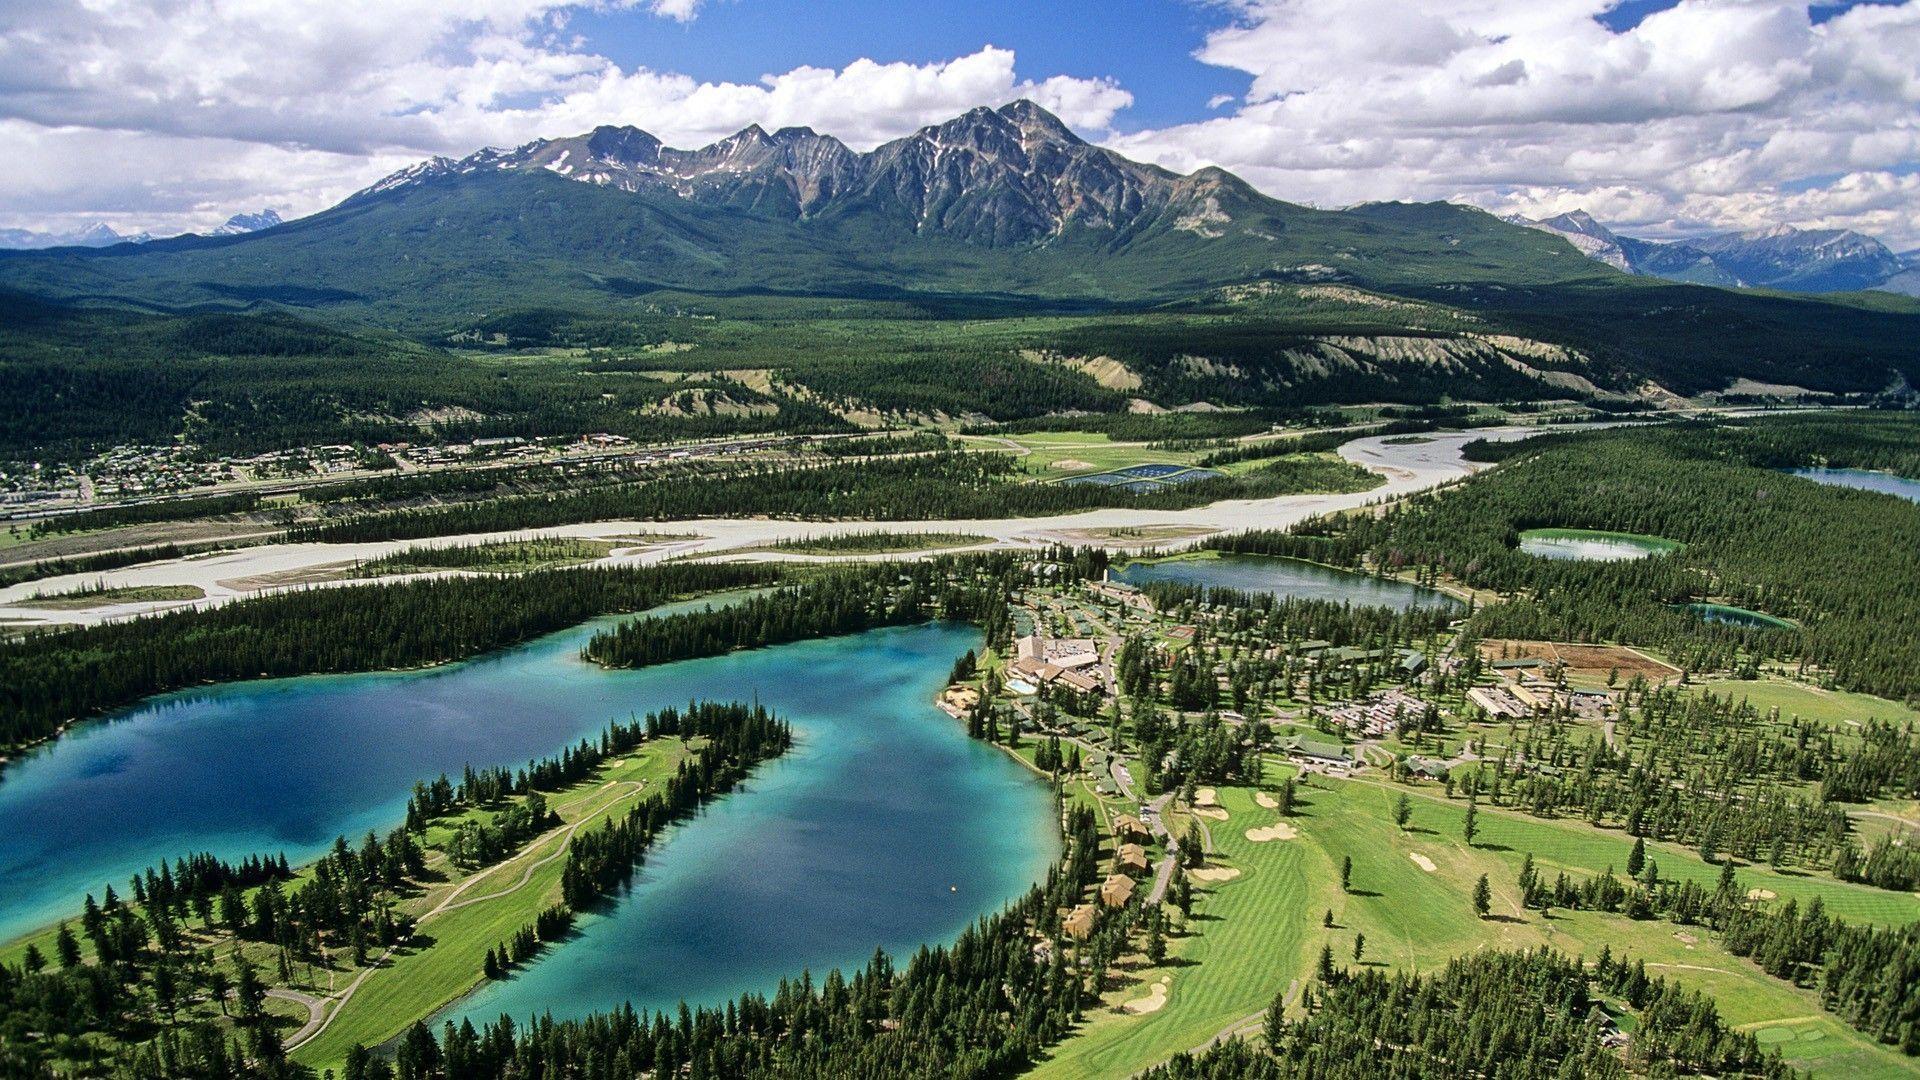 Alberta Jasper National Park Landscapes Wallpaper Alberta National Parks Park Landscape State Parks